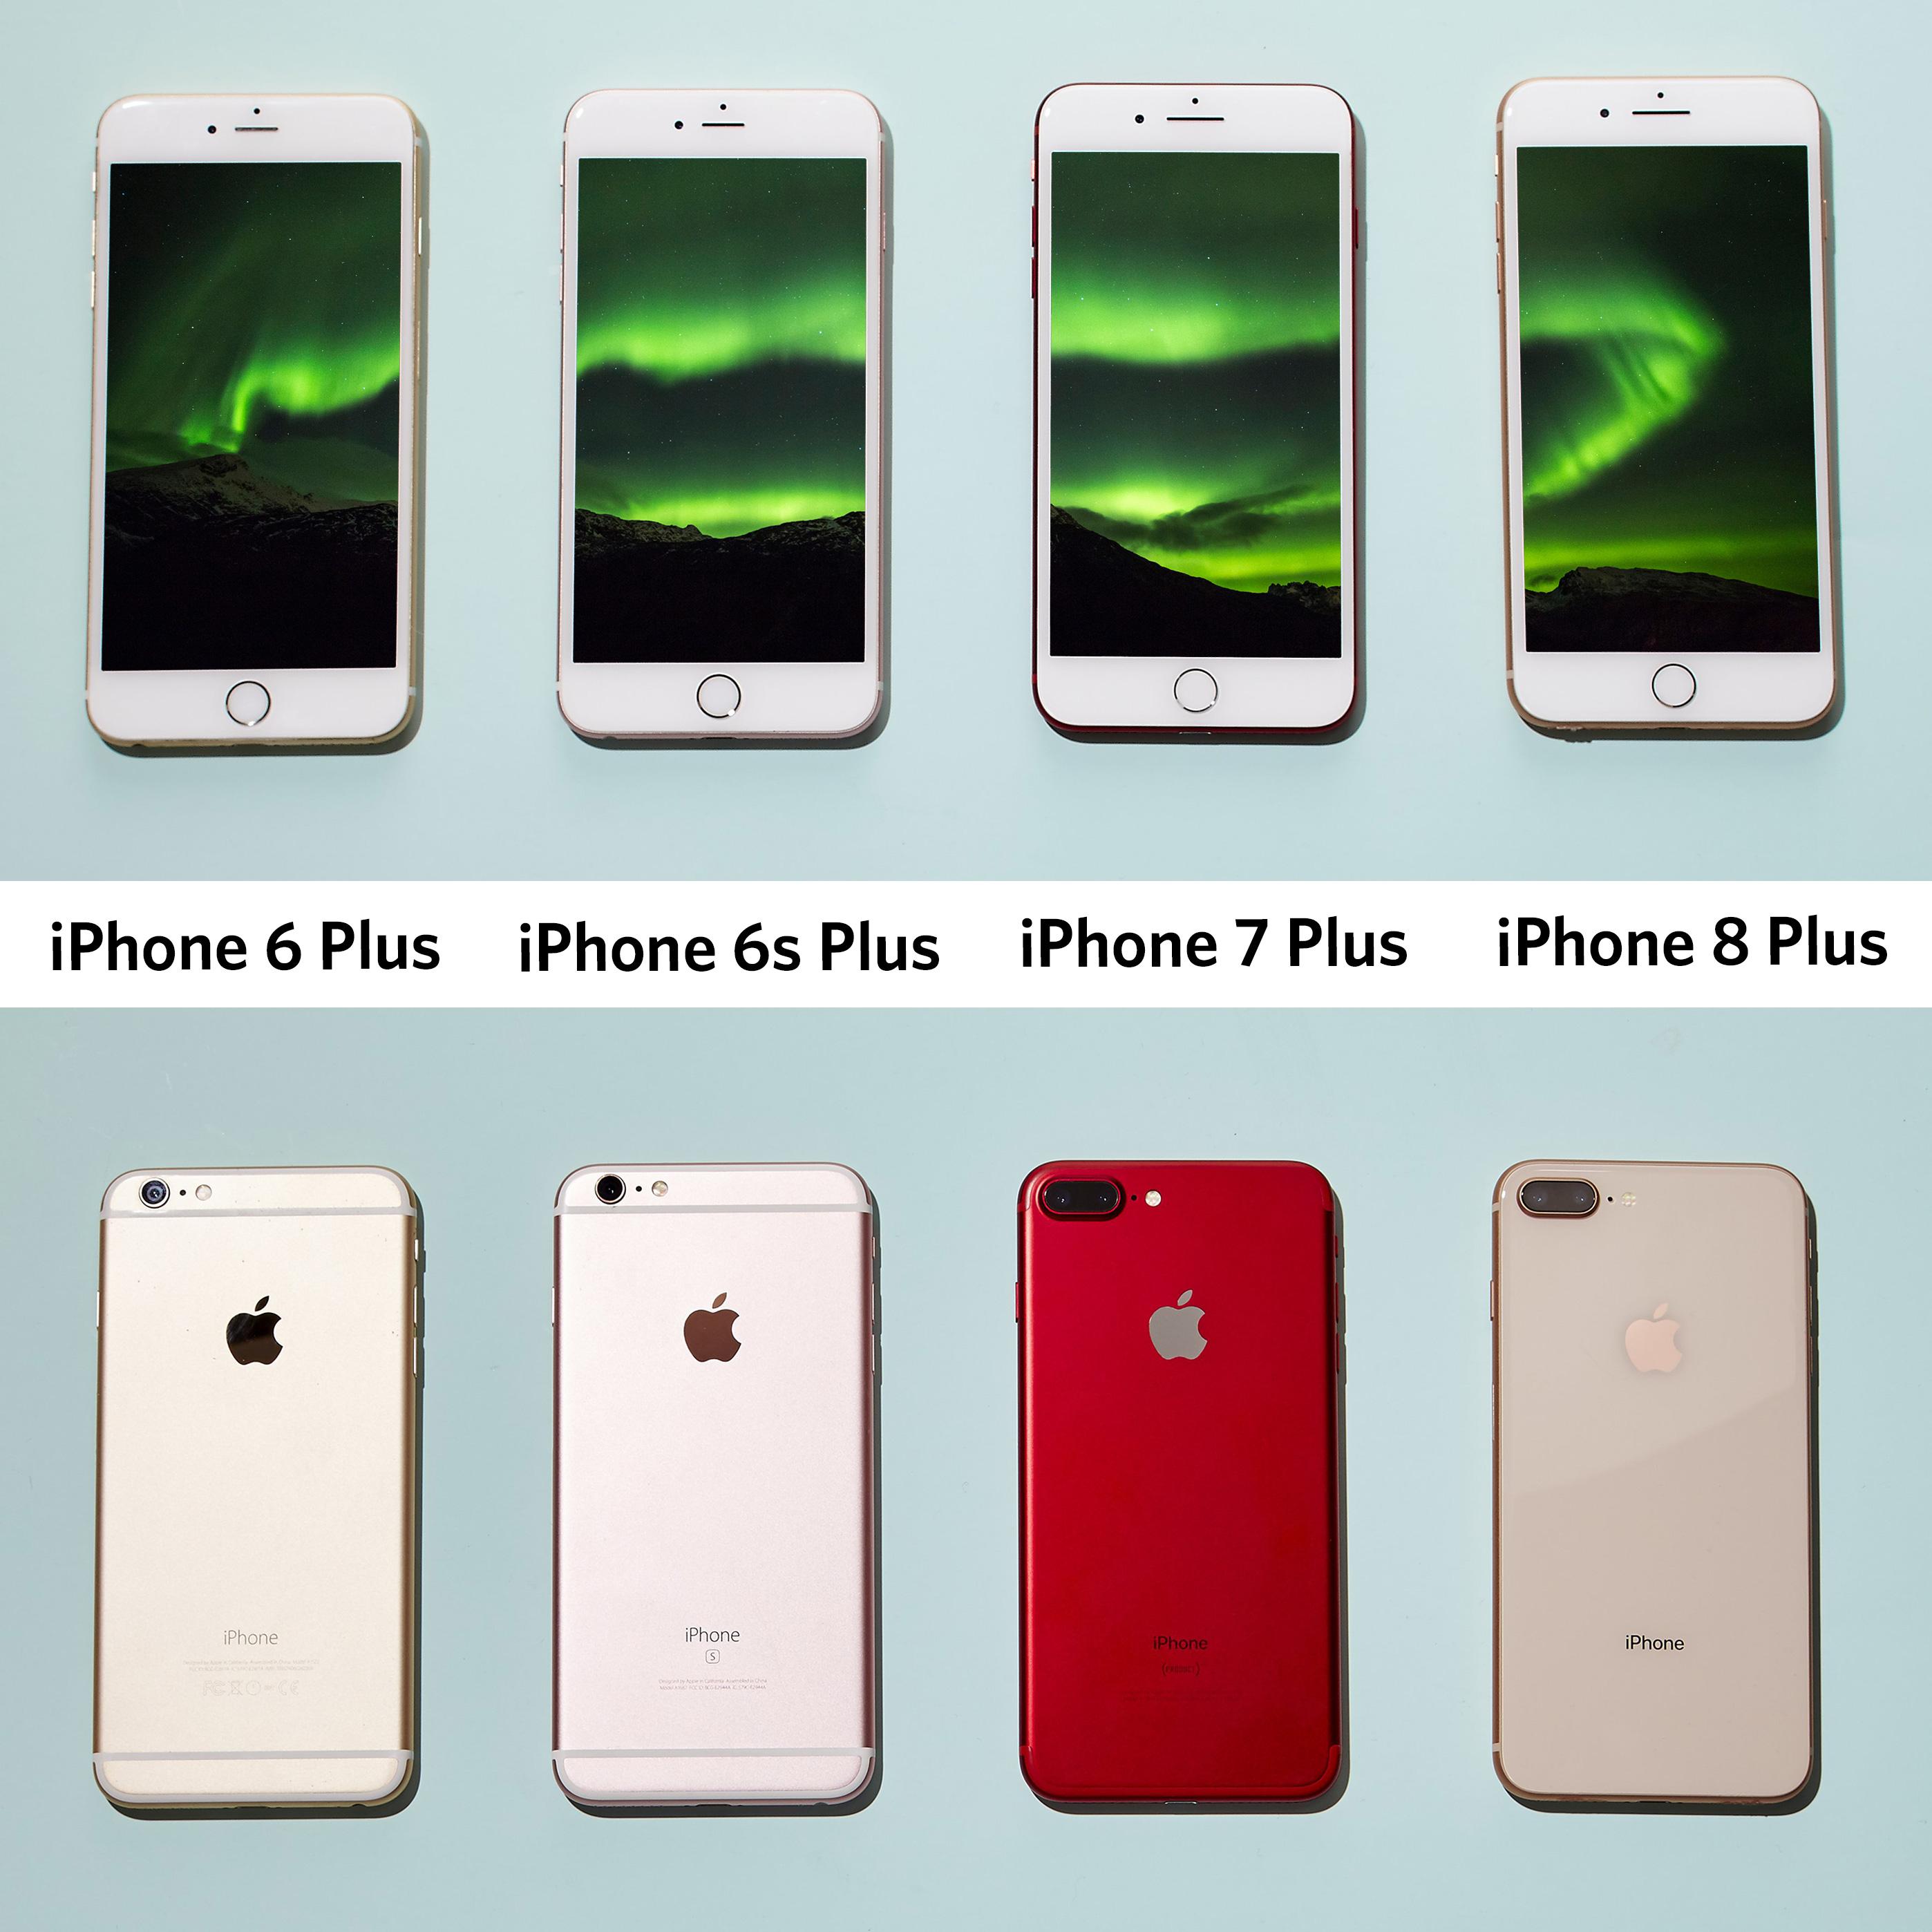 fiche technique iphone 7 plus vs iphone 8 plus